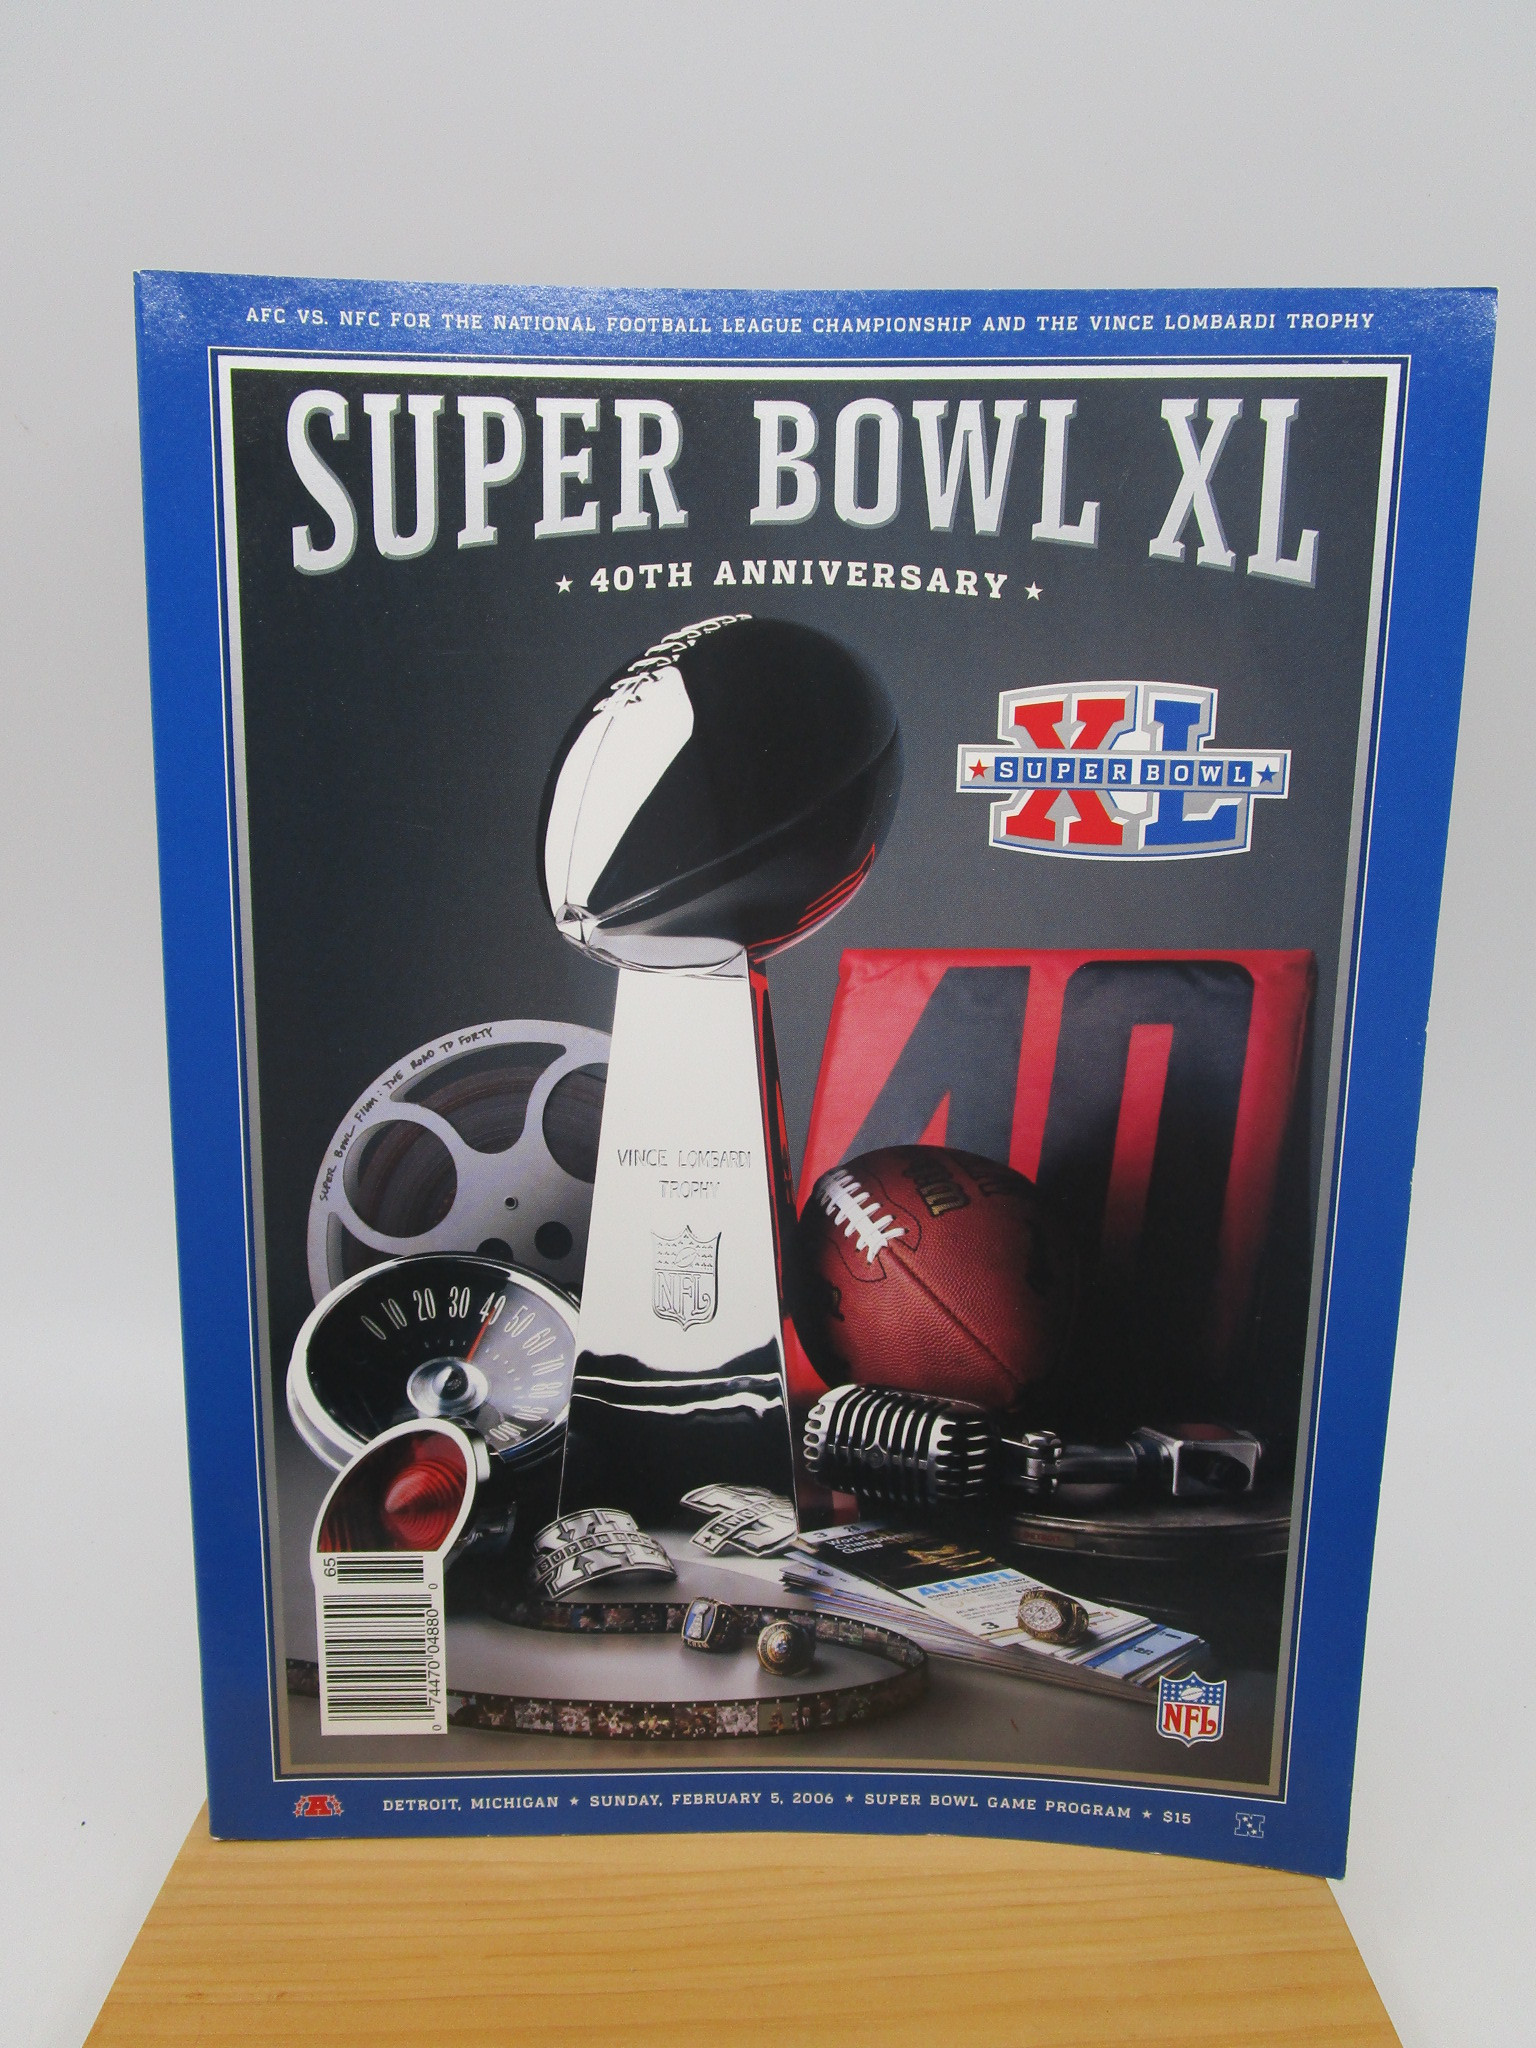 Image for Super Bowl XL: 40th Anniversary (Super Bowl Game Program, February 5, 2006)